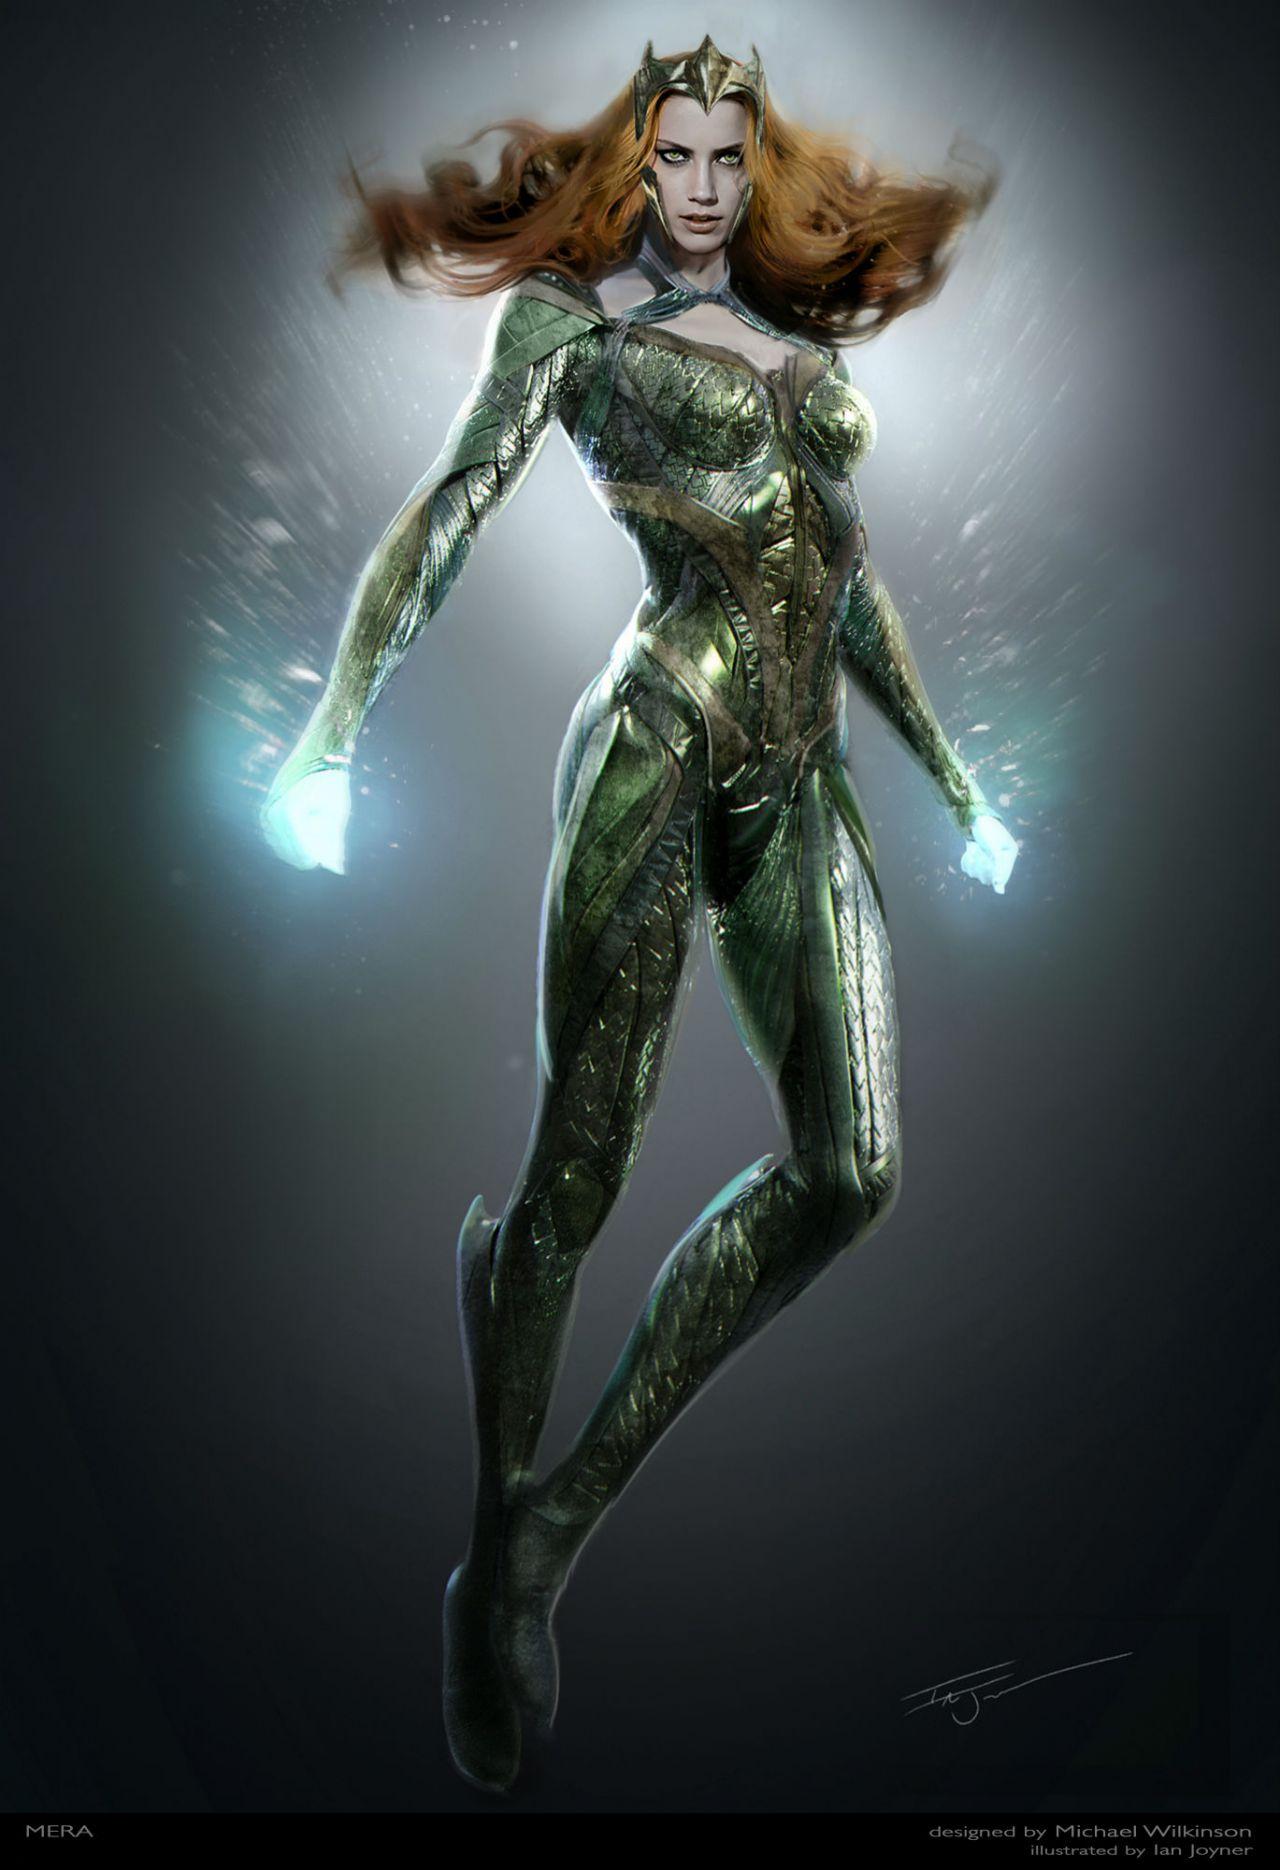 Justice League Mera Concept Art